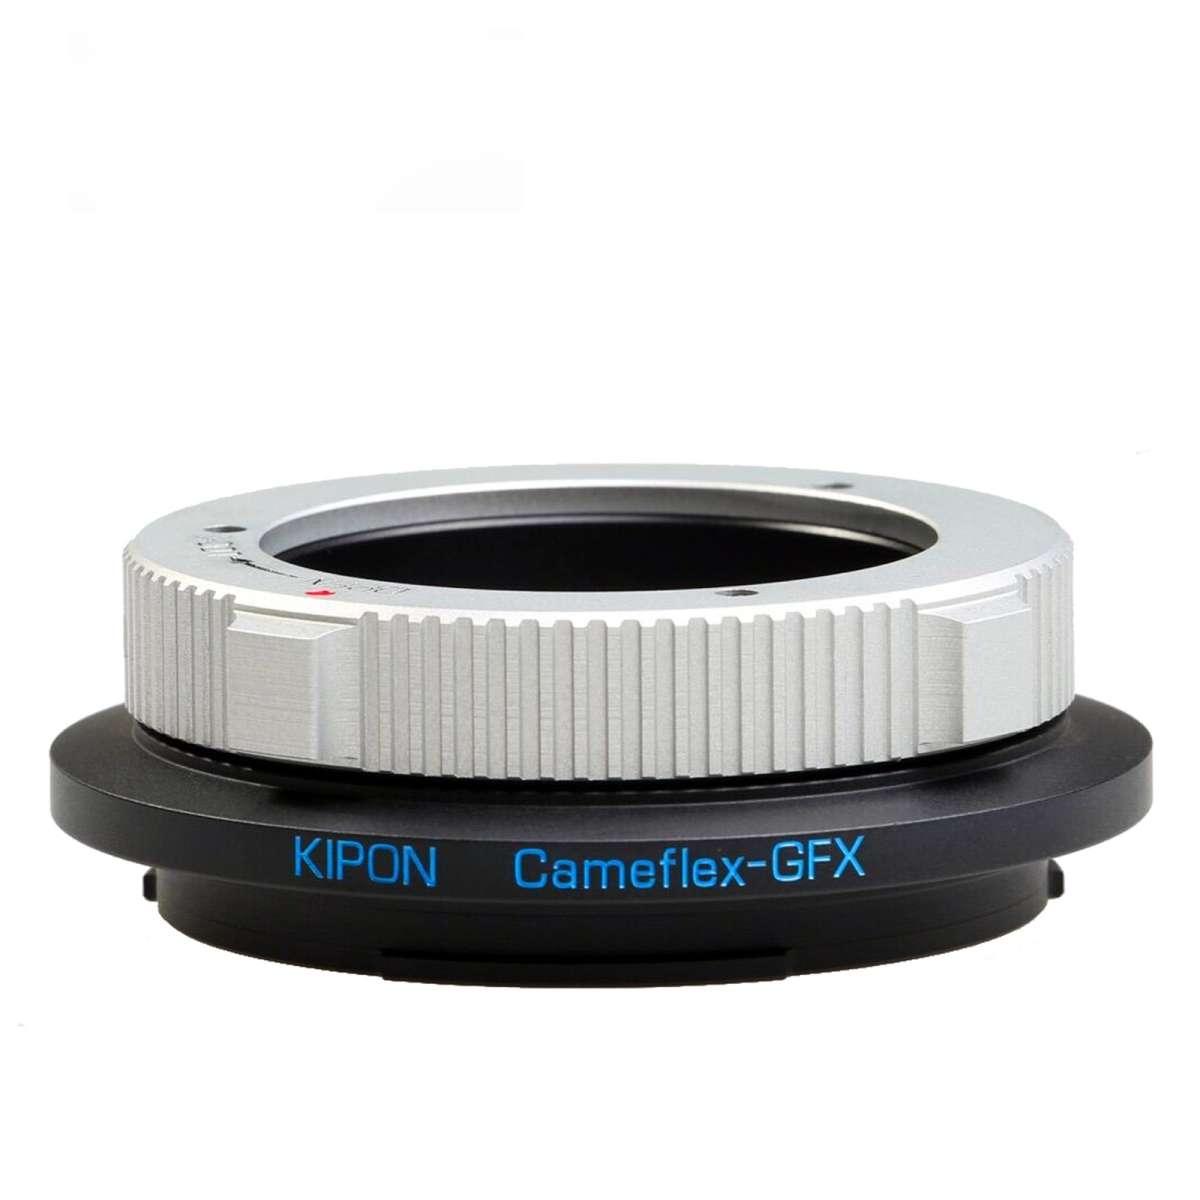 Kipon Adapter Fr Pro Cameflex Auf Fuji Gfx Foto Walser Mamiya 645 Mount Lens To Medium Format Camera